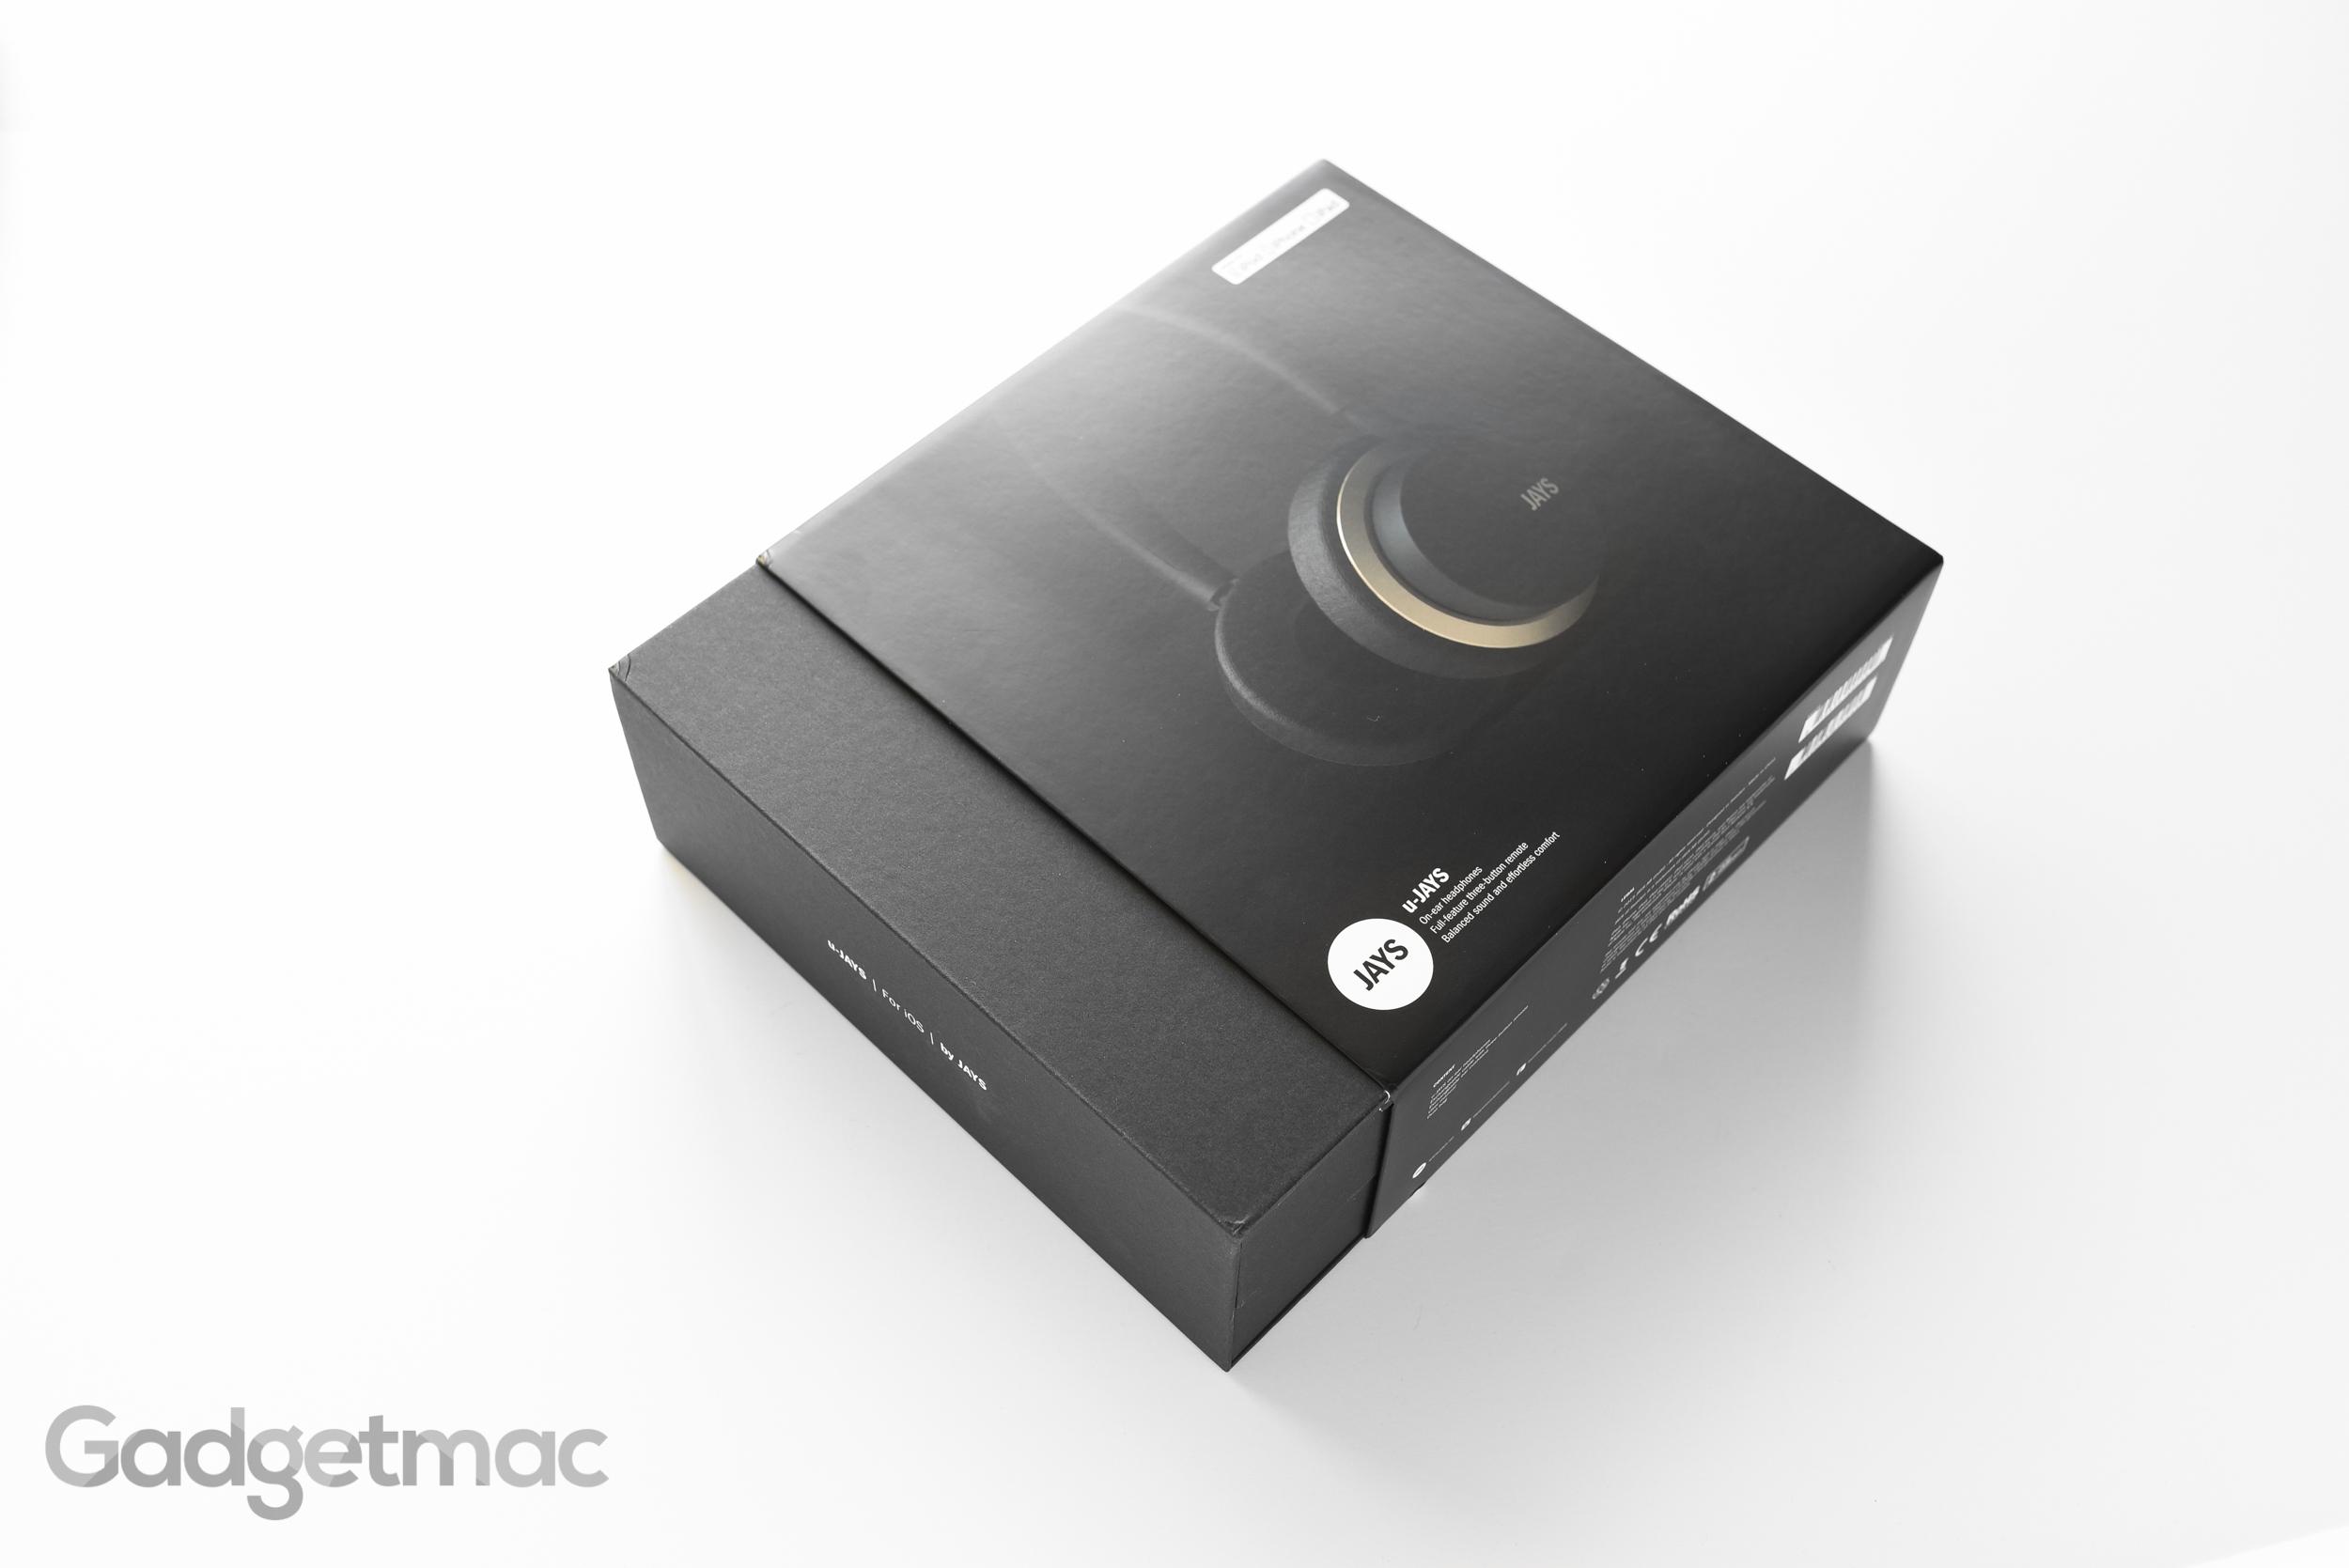 jays-u-jays-for-ios-packaging.jpg